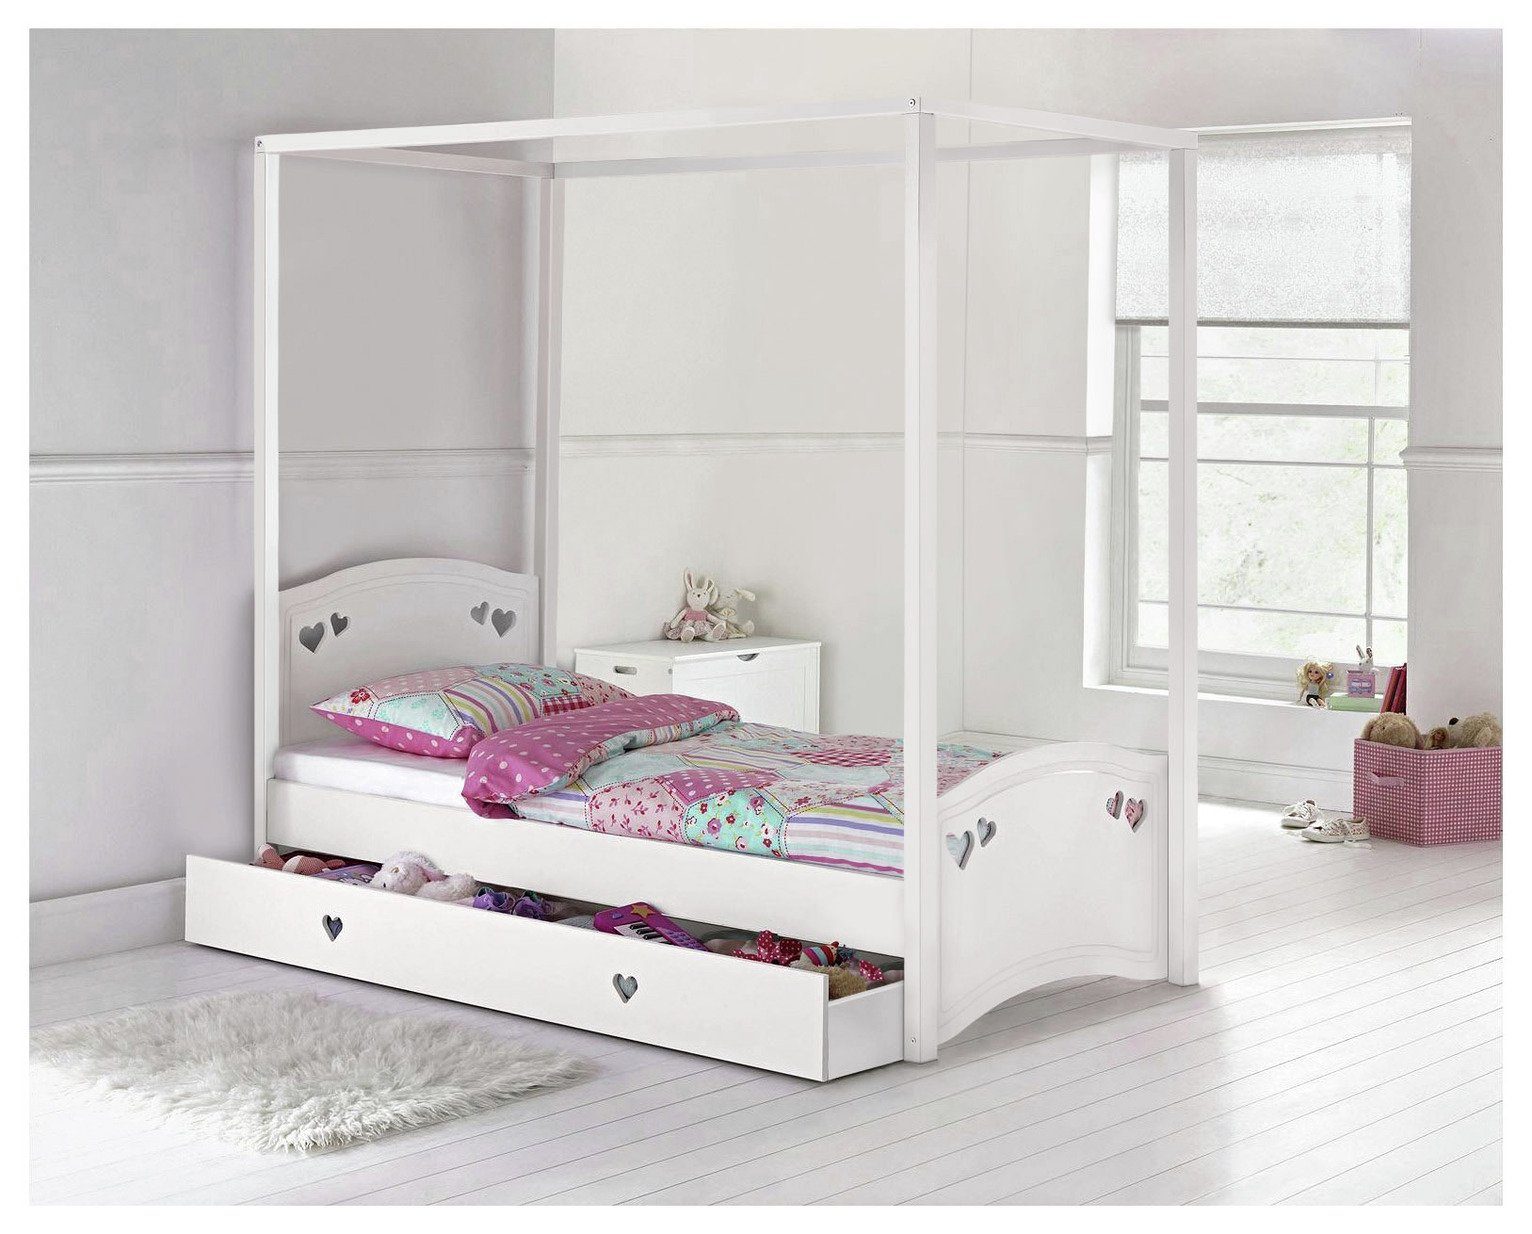 Argos Home Mia Single 4 Poster Bed and Kids Mattress - White